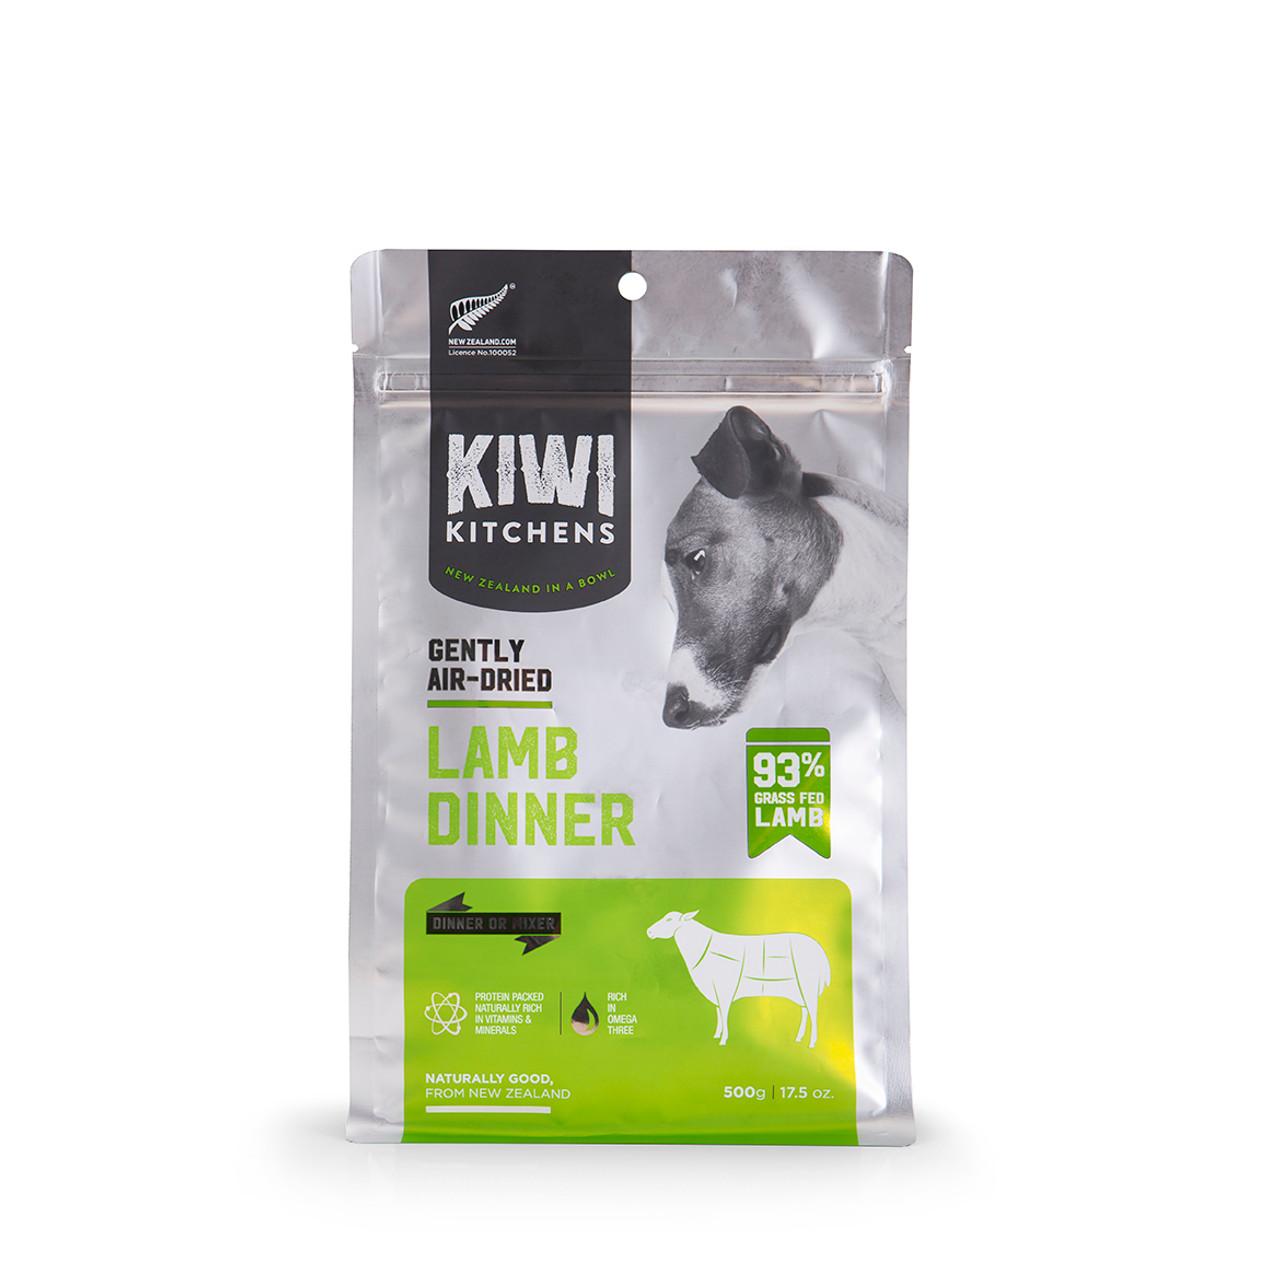 Kiwi Kitchens Gently Air-Dried Lamb Dinner Dog Food